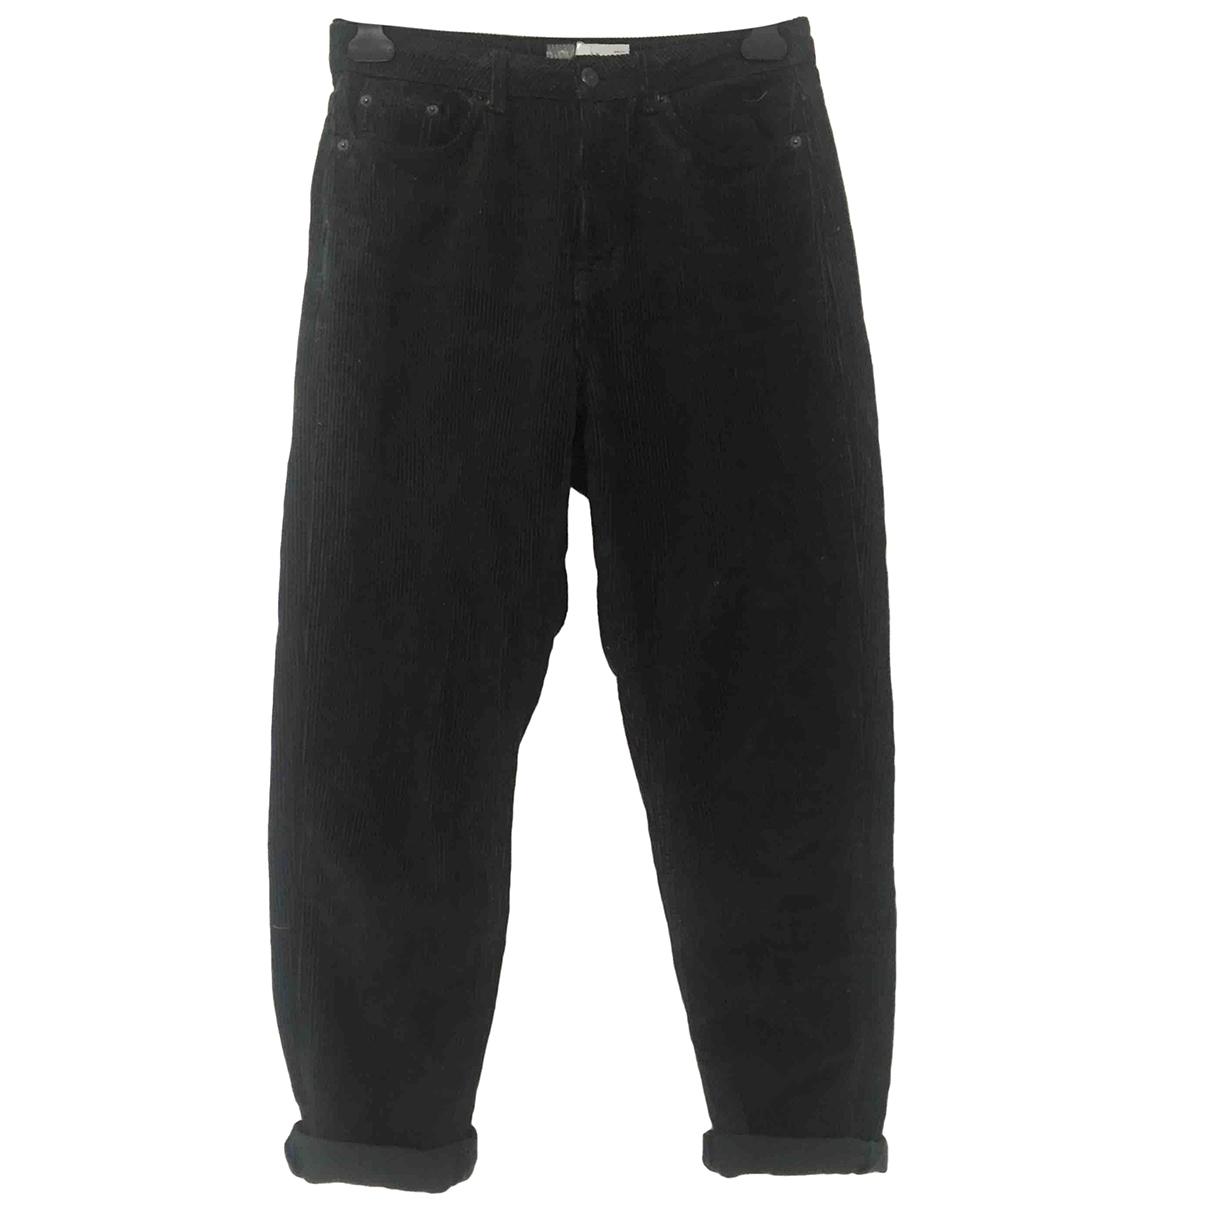 tophop \N Green Denim - Jeans Trousers for Women 8 UK